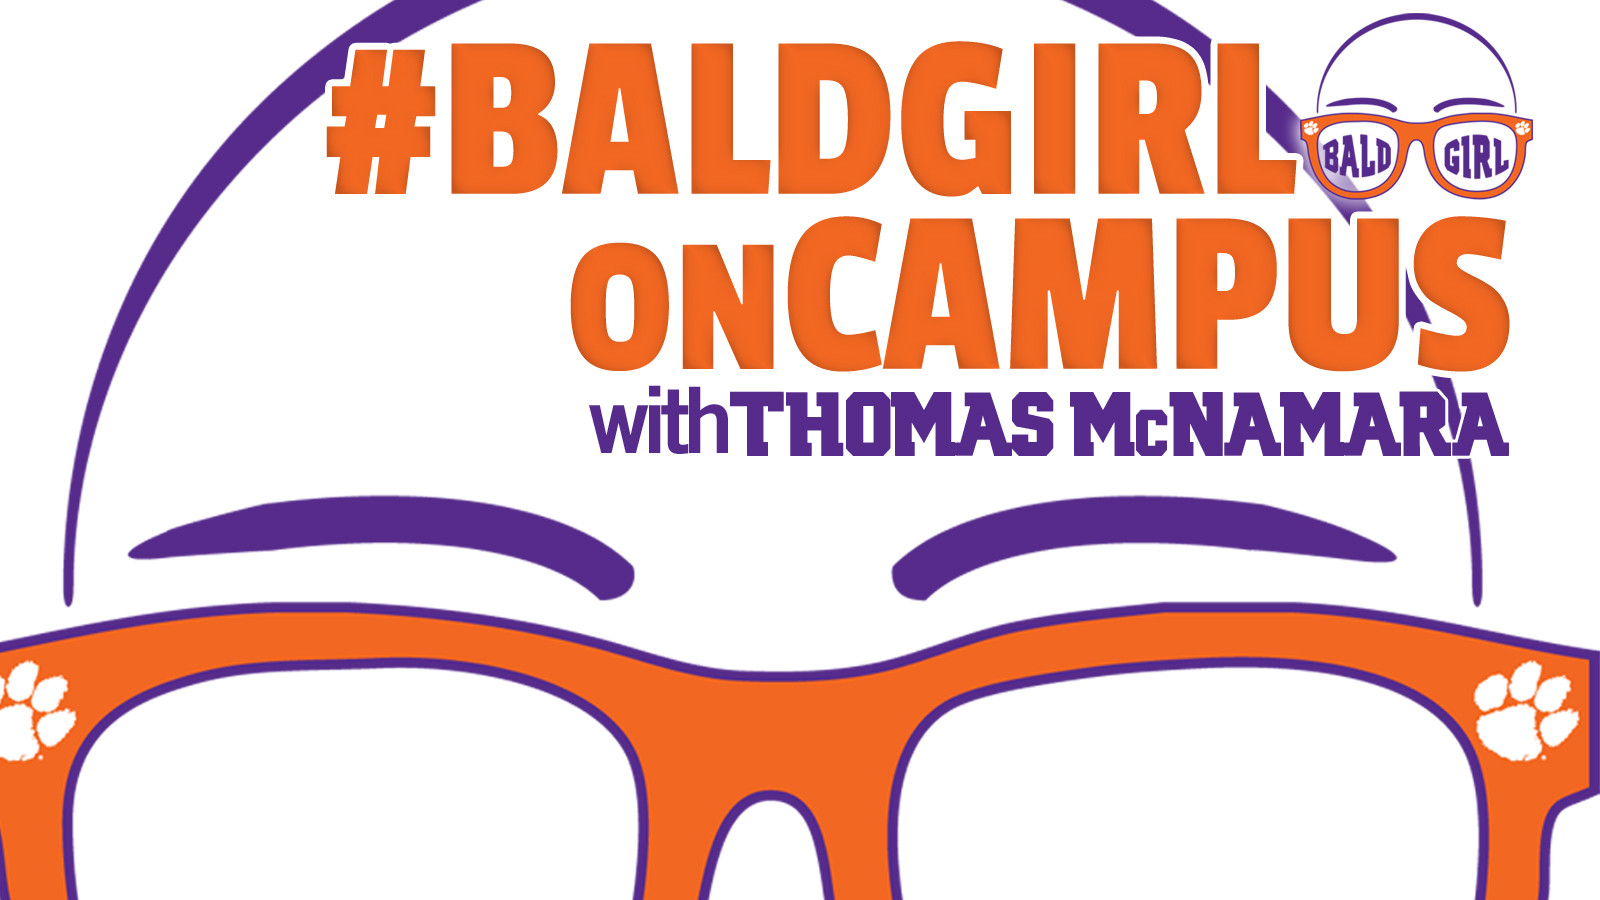 ClemsonTigers.com's Bald Girl on Campus: Men's Soccer's Thomas McNamara